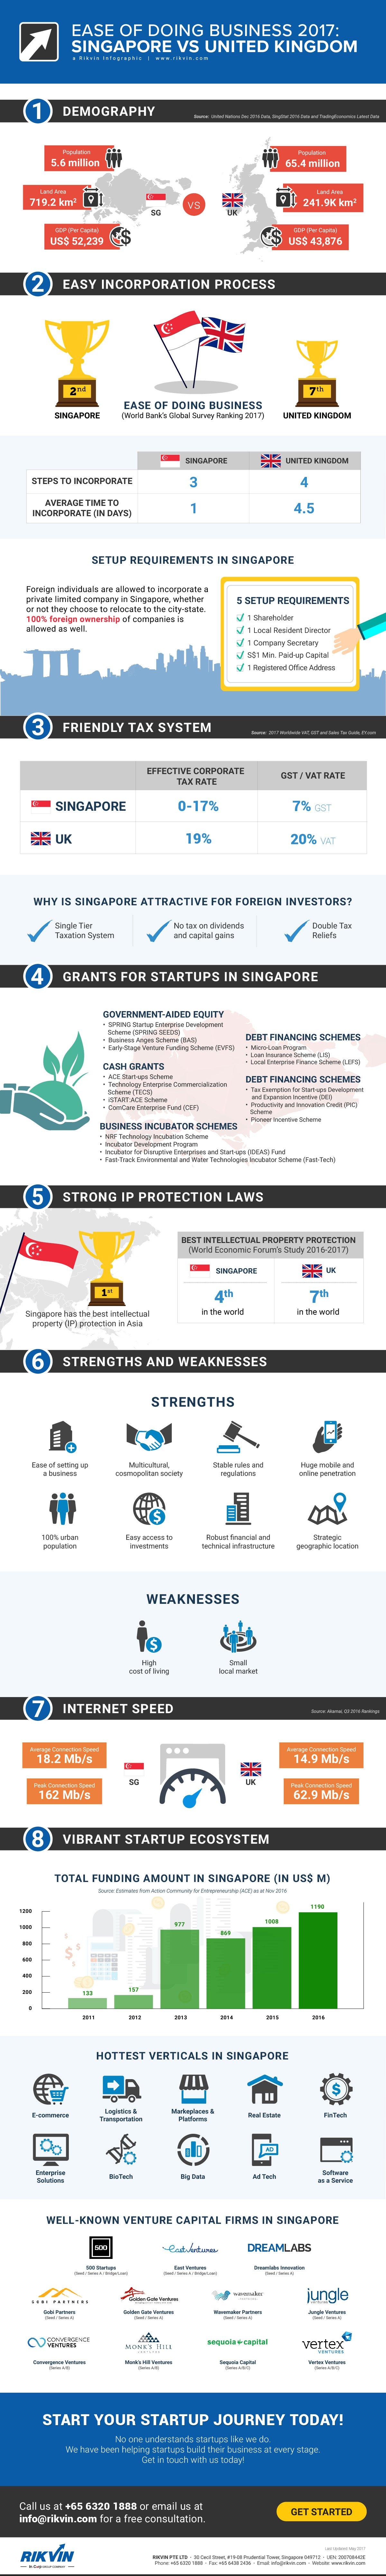 singapore vs uk for business